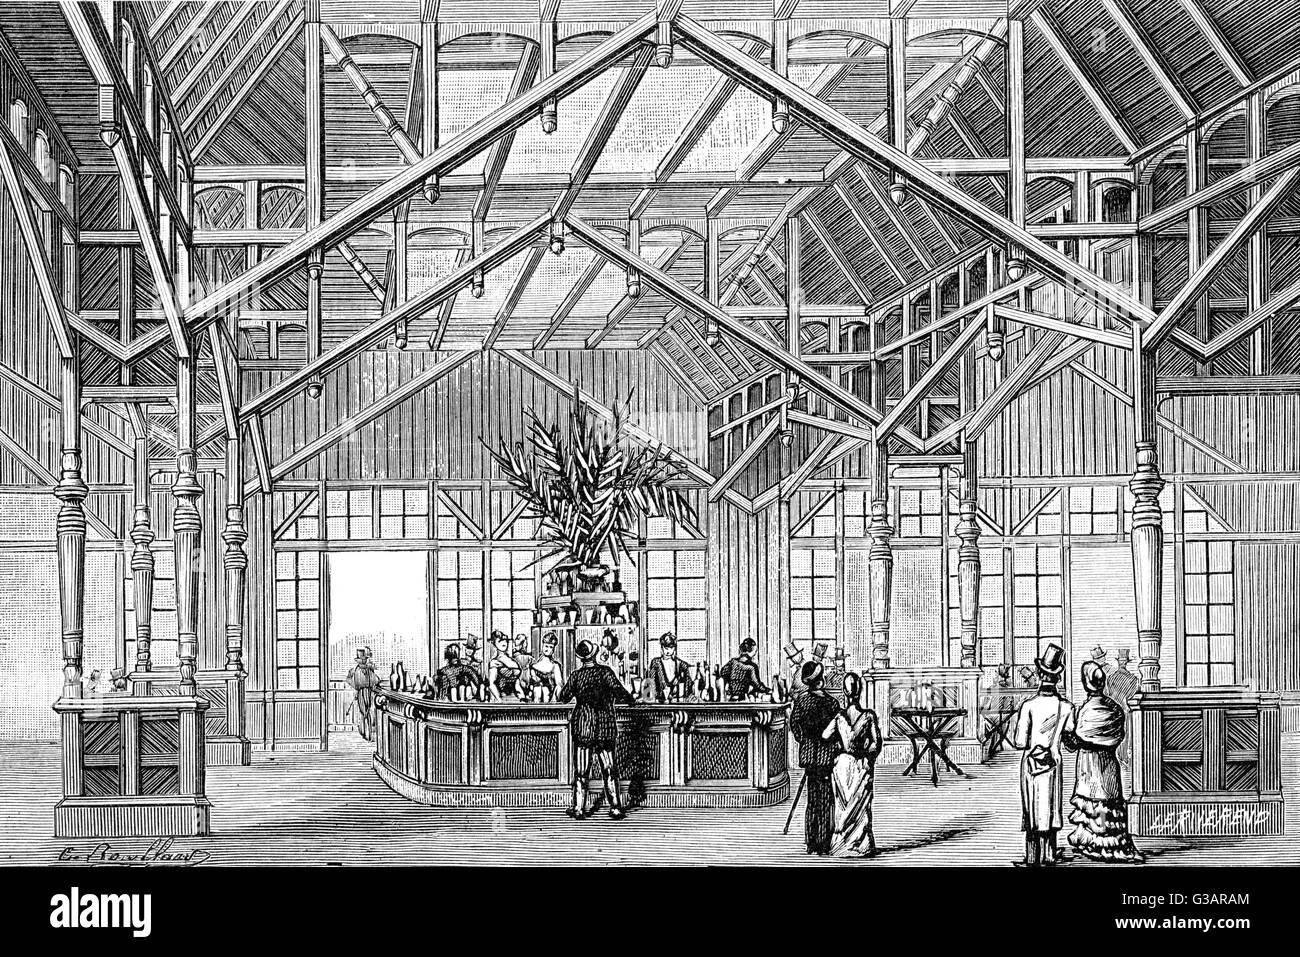 Paris, France - La Tour Eiffel, Ango-American Bar.     Date: 1889 - Stock Image